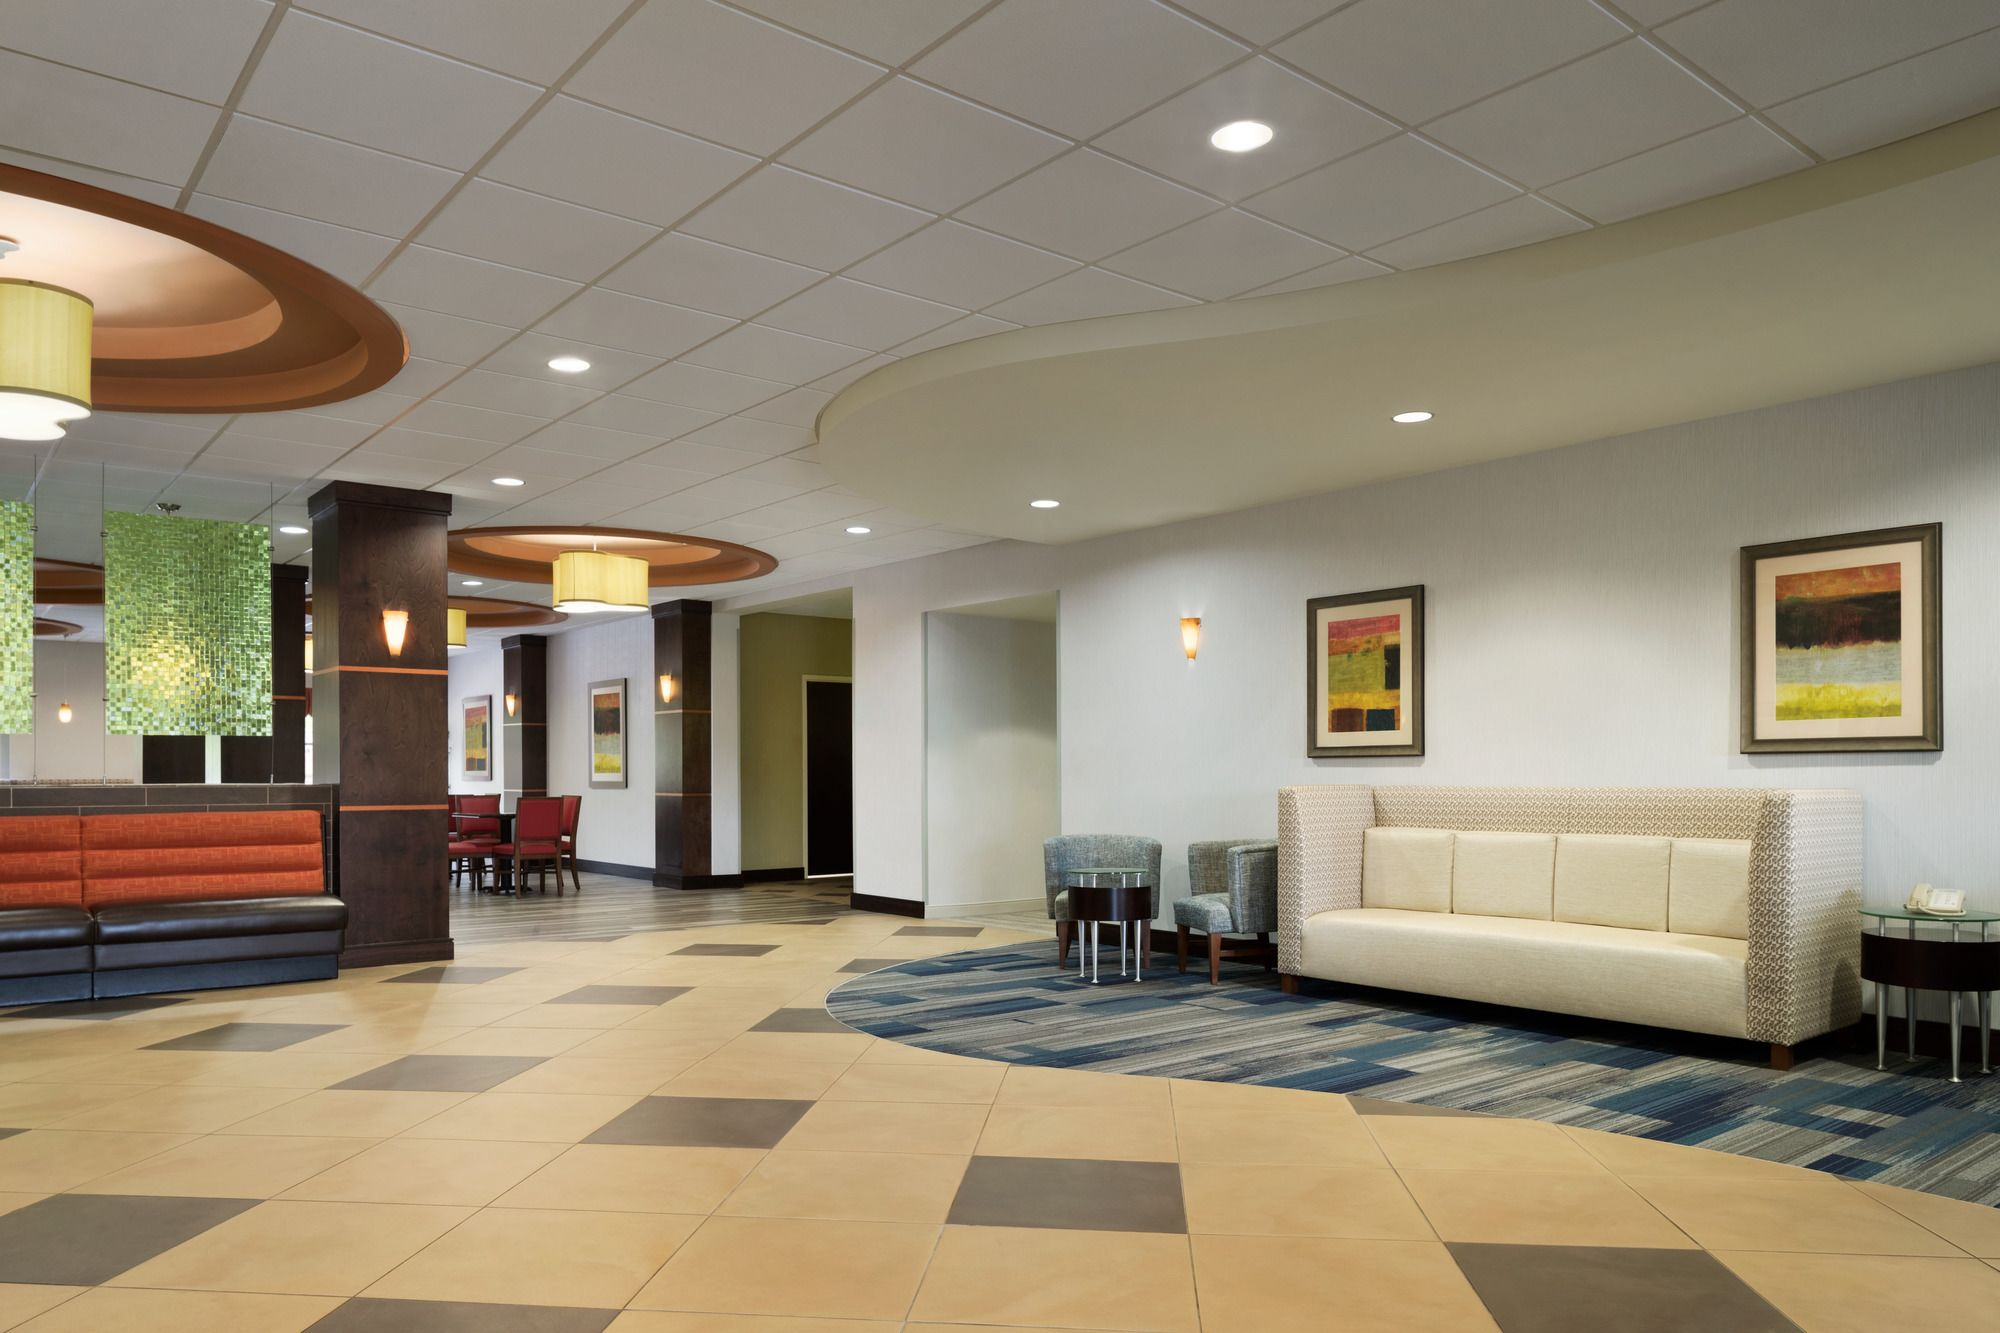 Holiday Inn Express in Clinton, TN